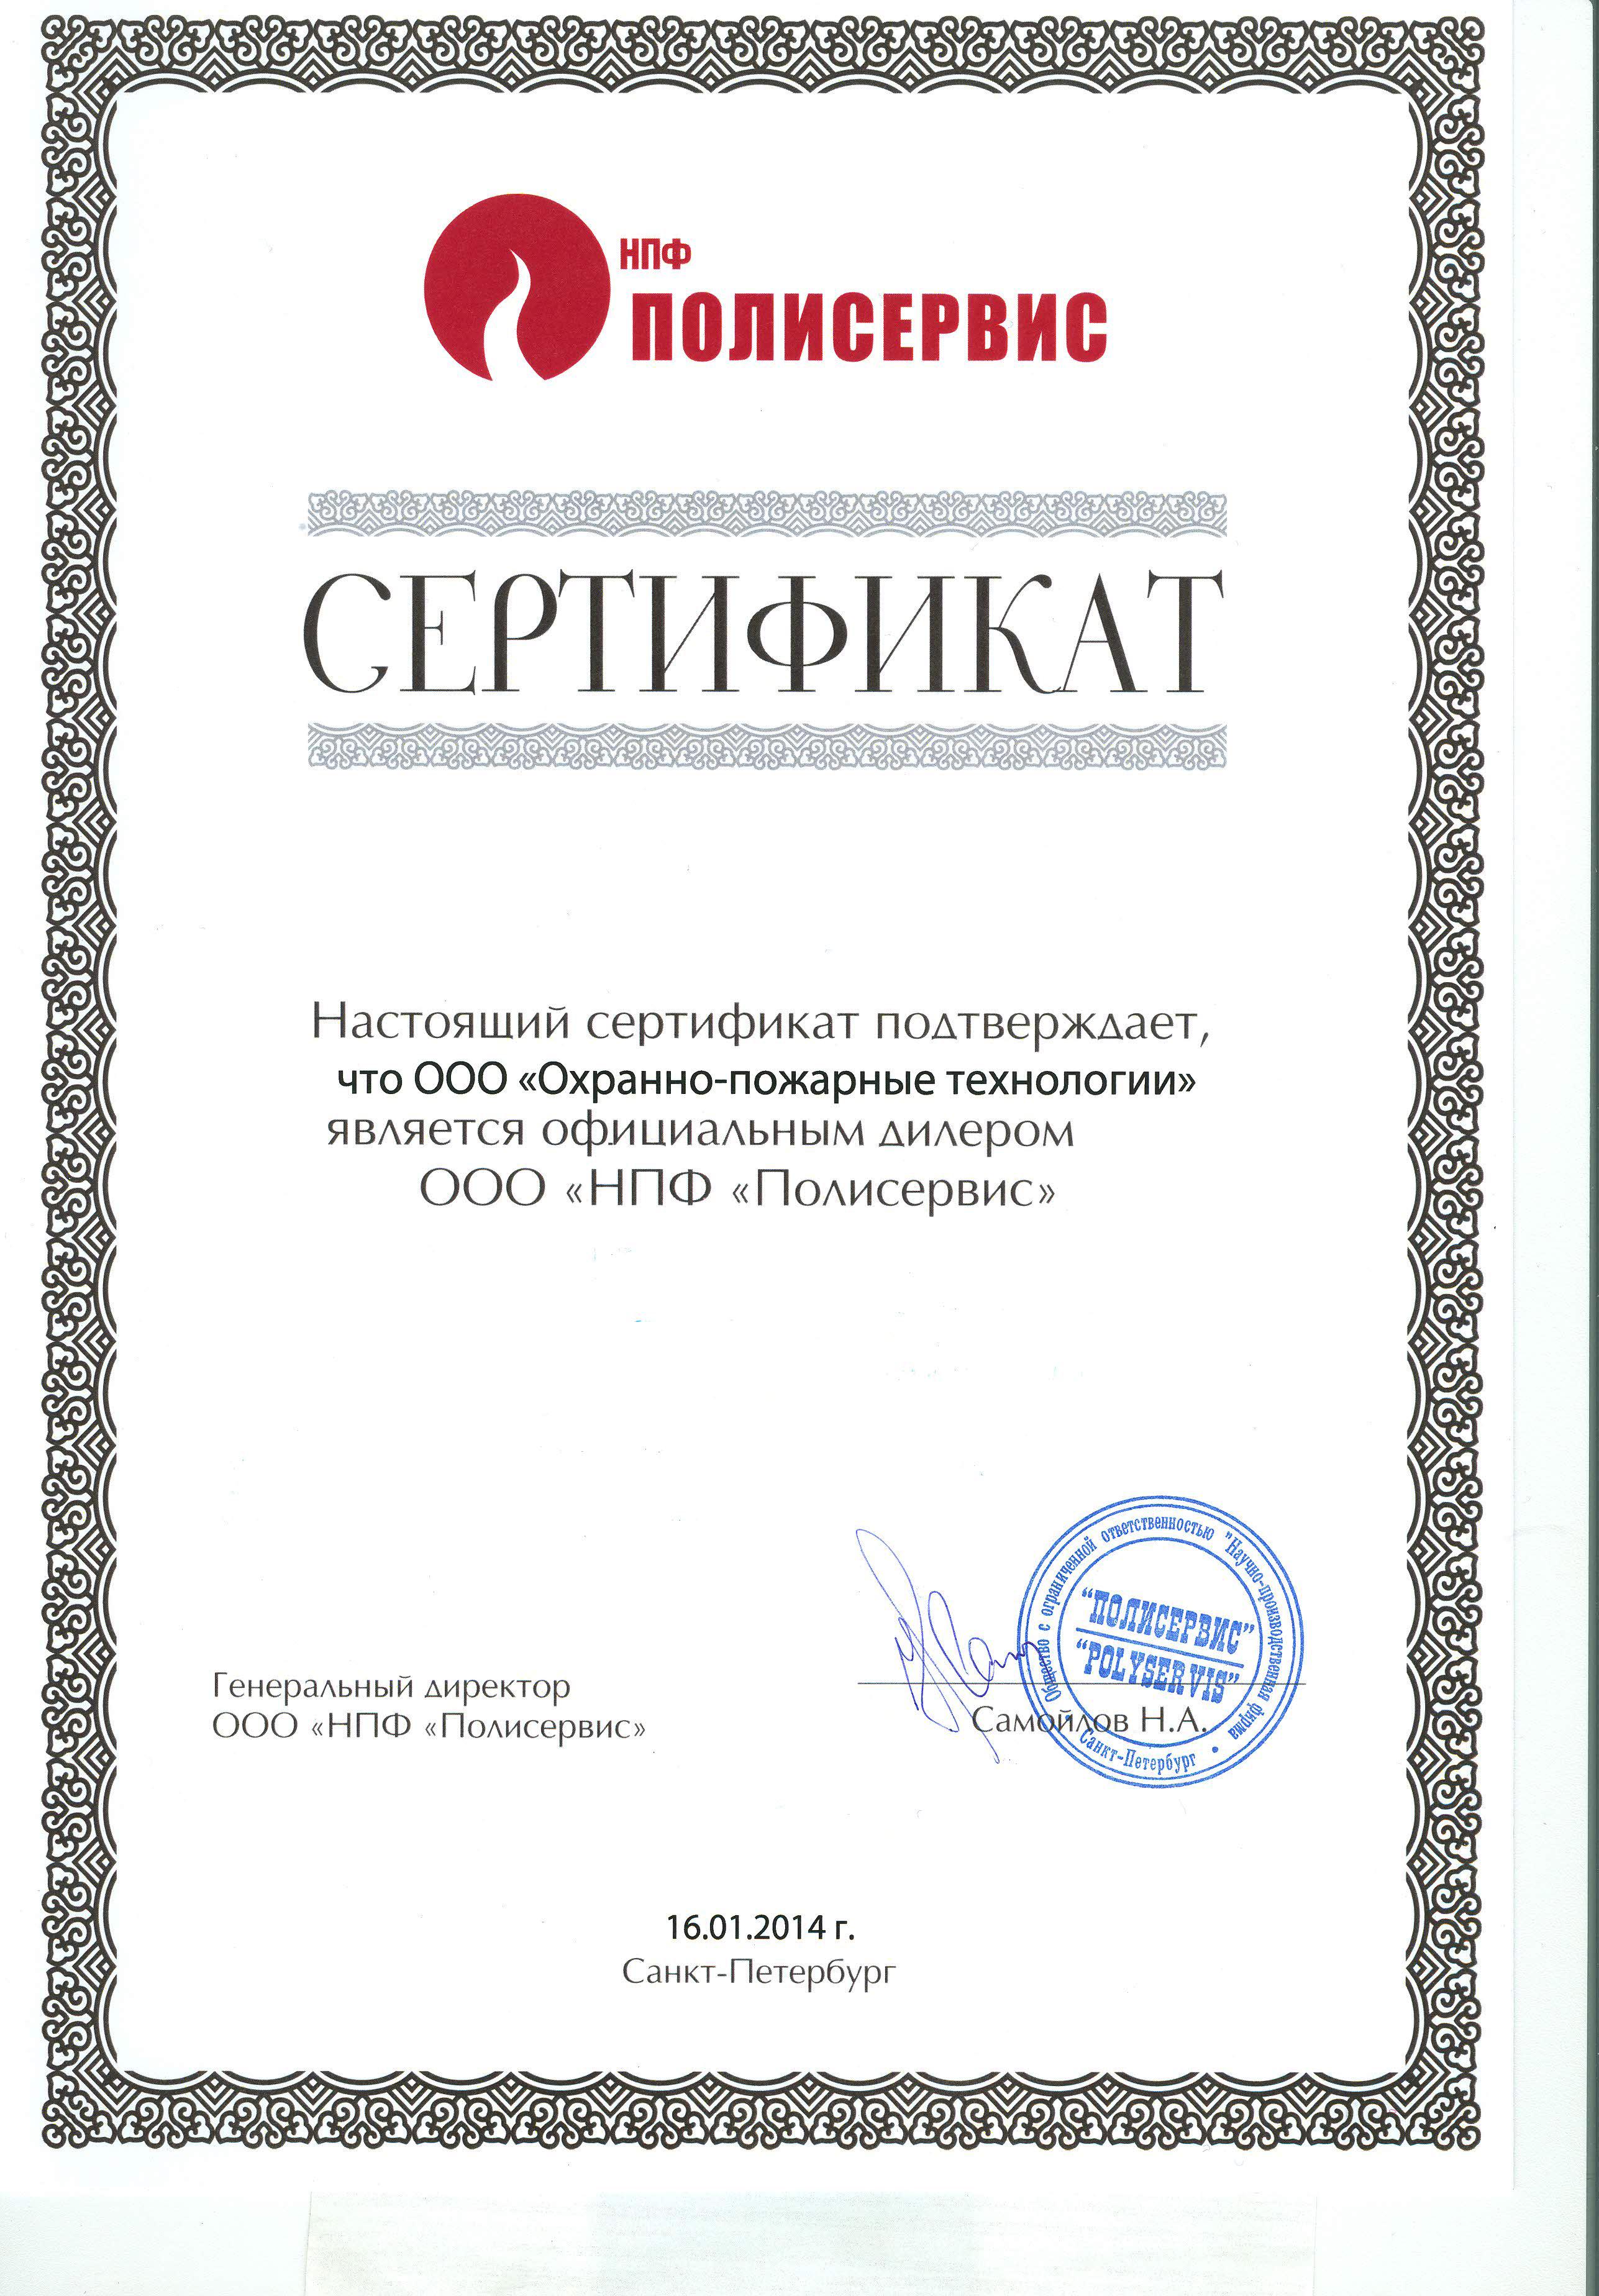 Полисервис сертификат